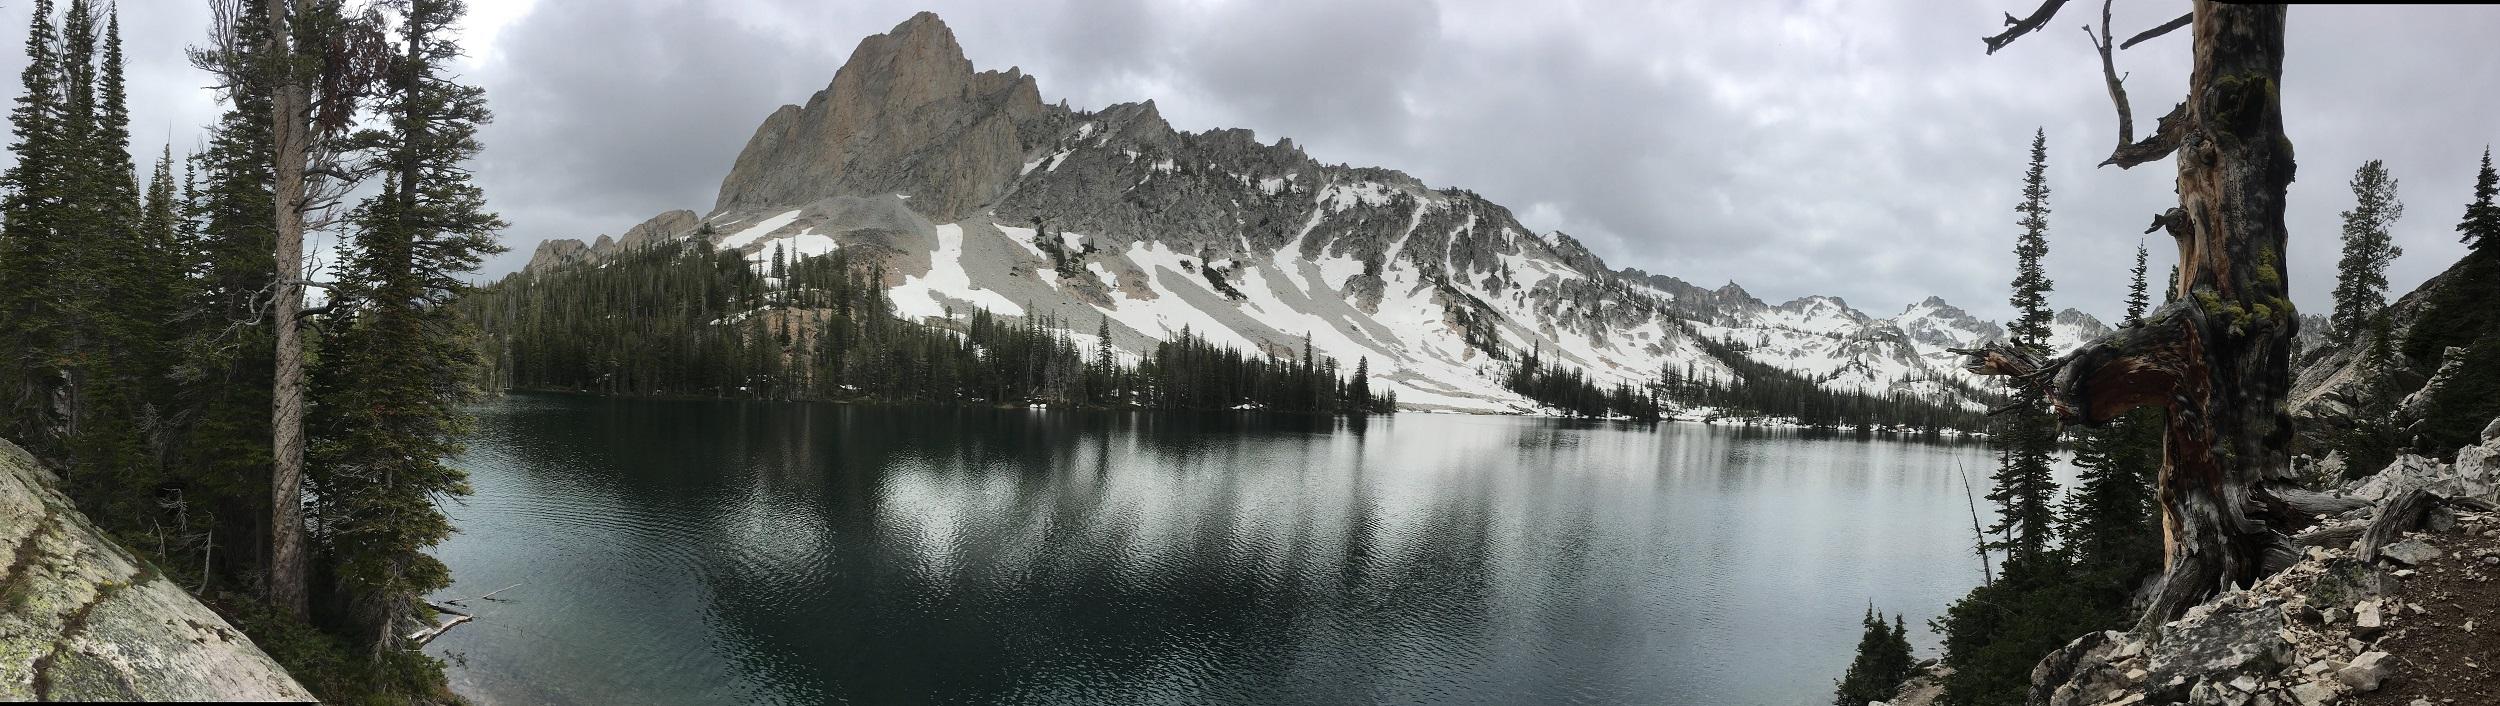 Alice Lake. Enough said.